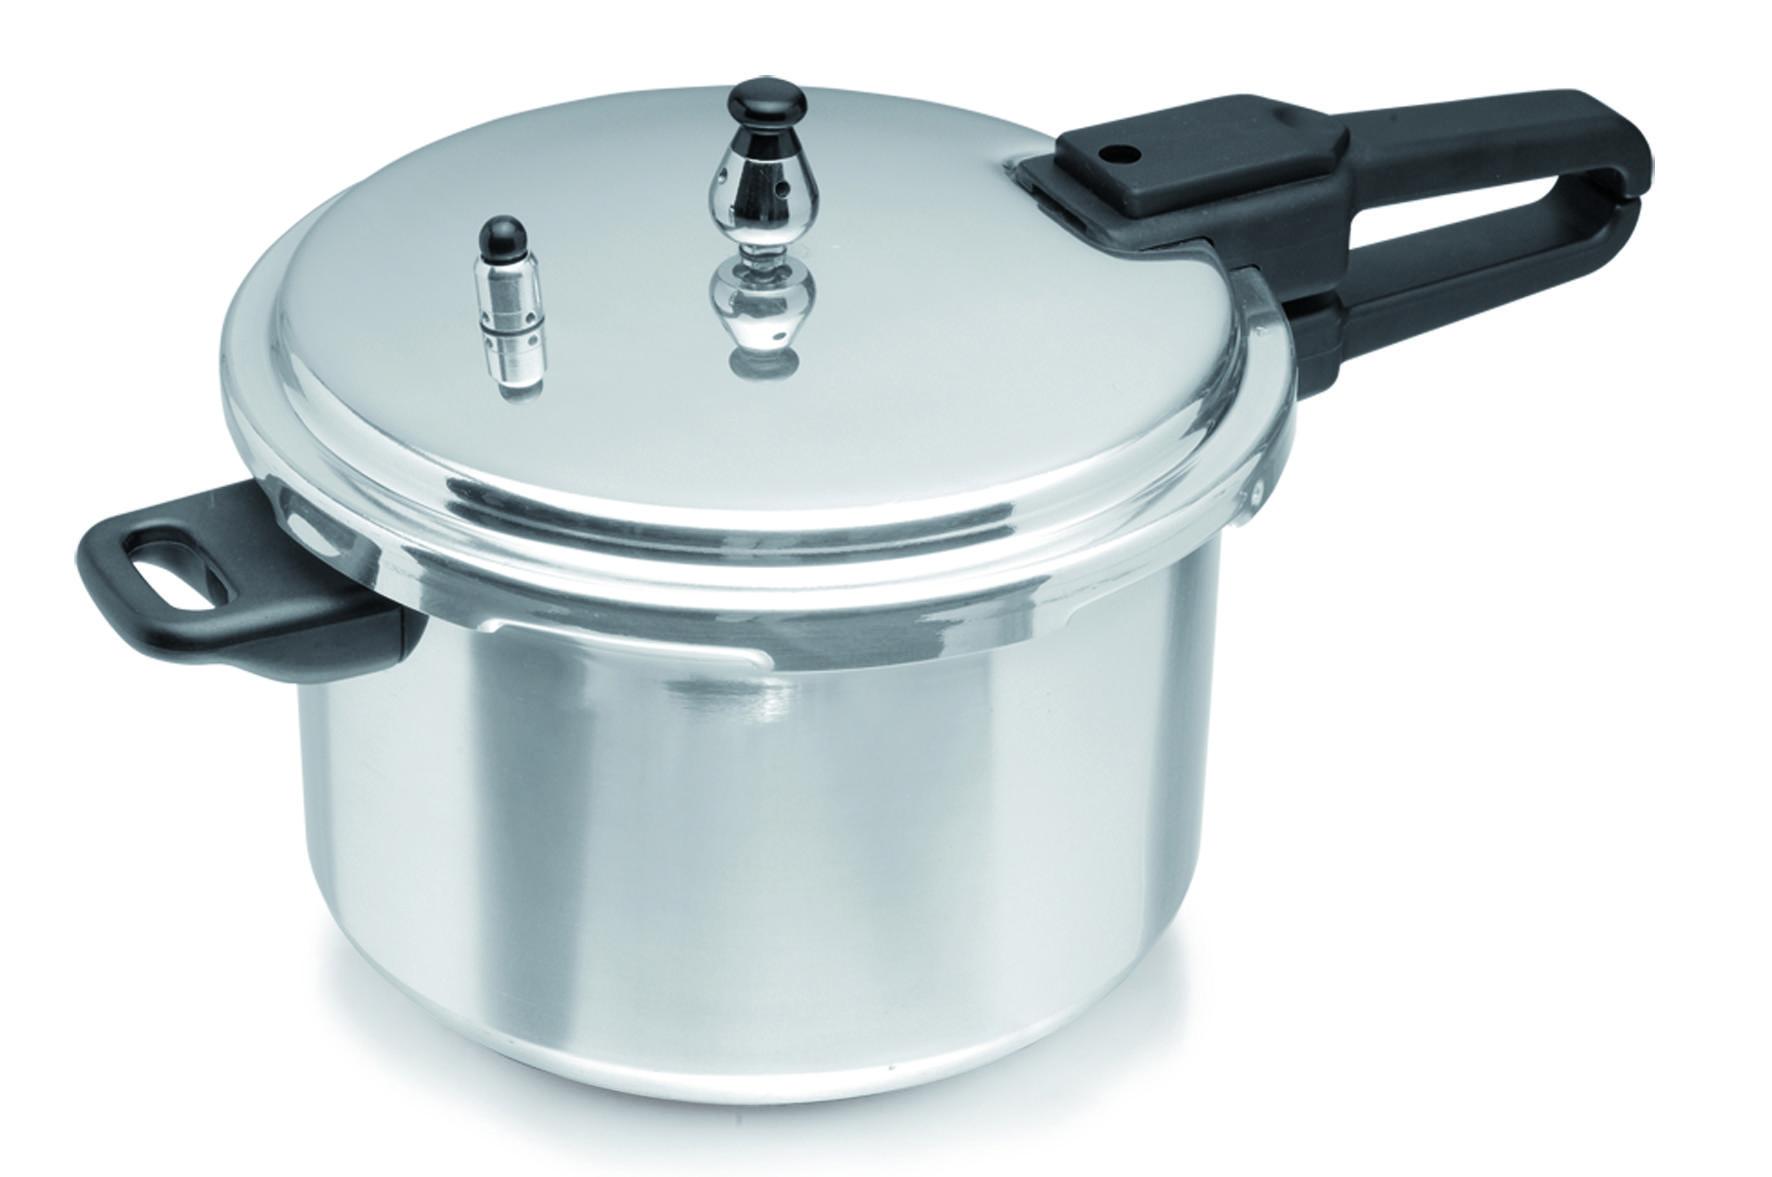 Imusa 4 Quart Pressure Cooker - THE GAUNAURD GROUP INC.